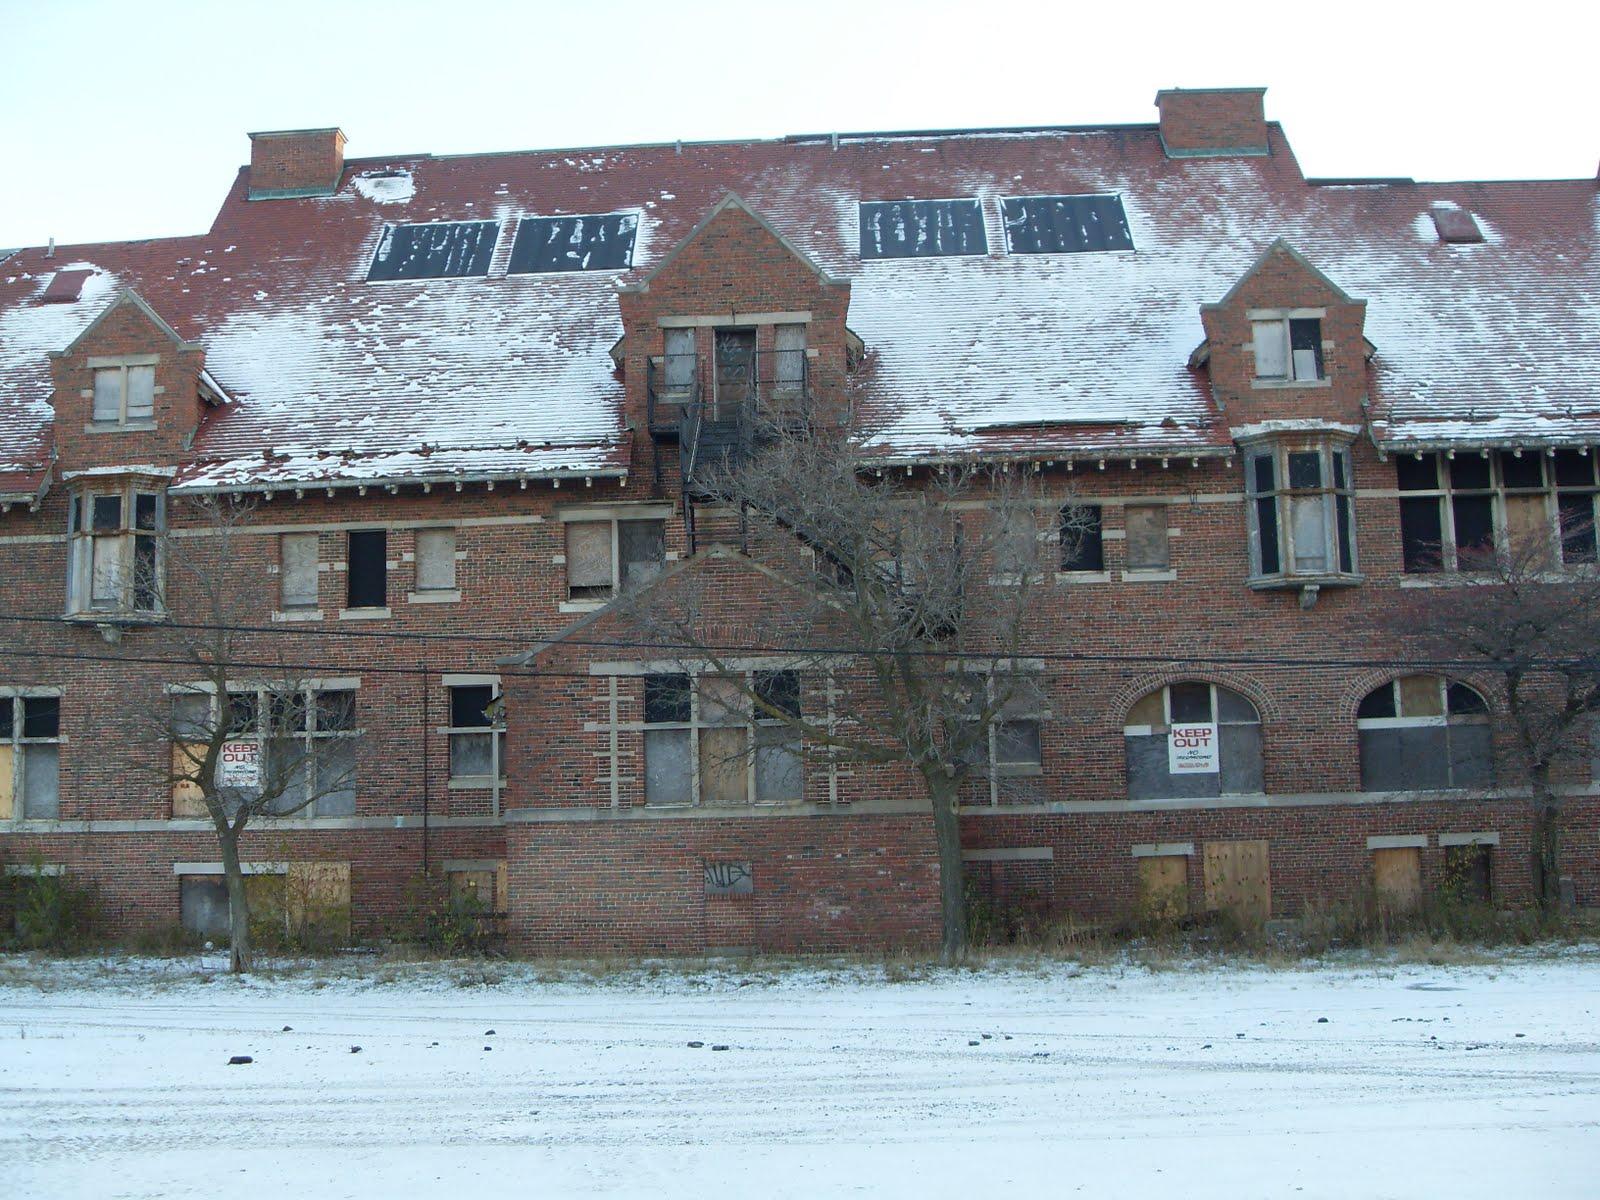 Milwaukee 39 s dark history not forgotten viral for Classic house 2003